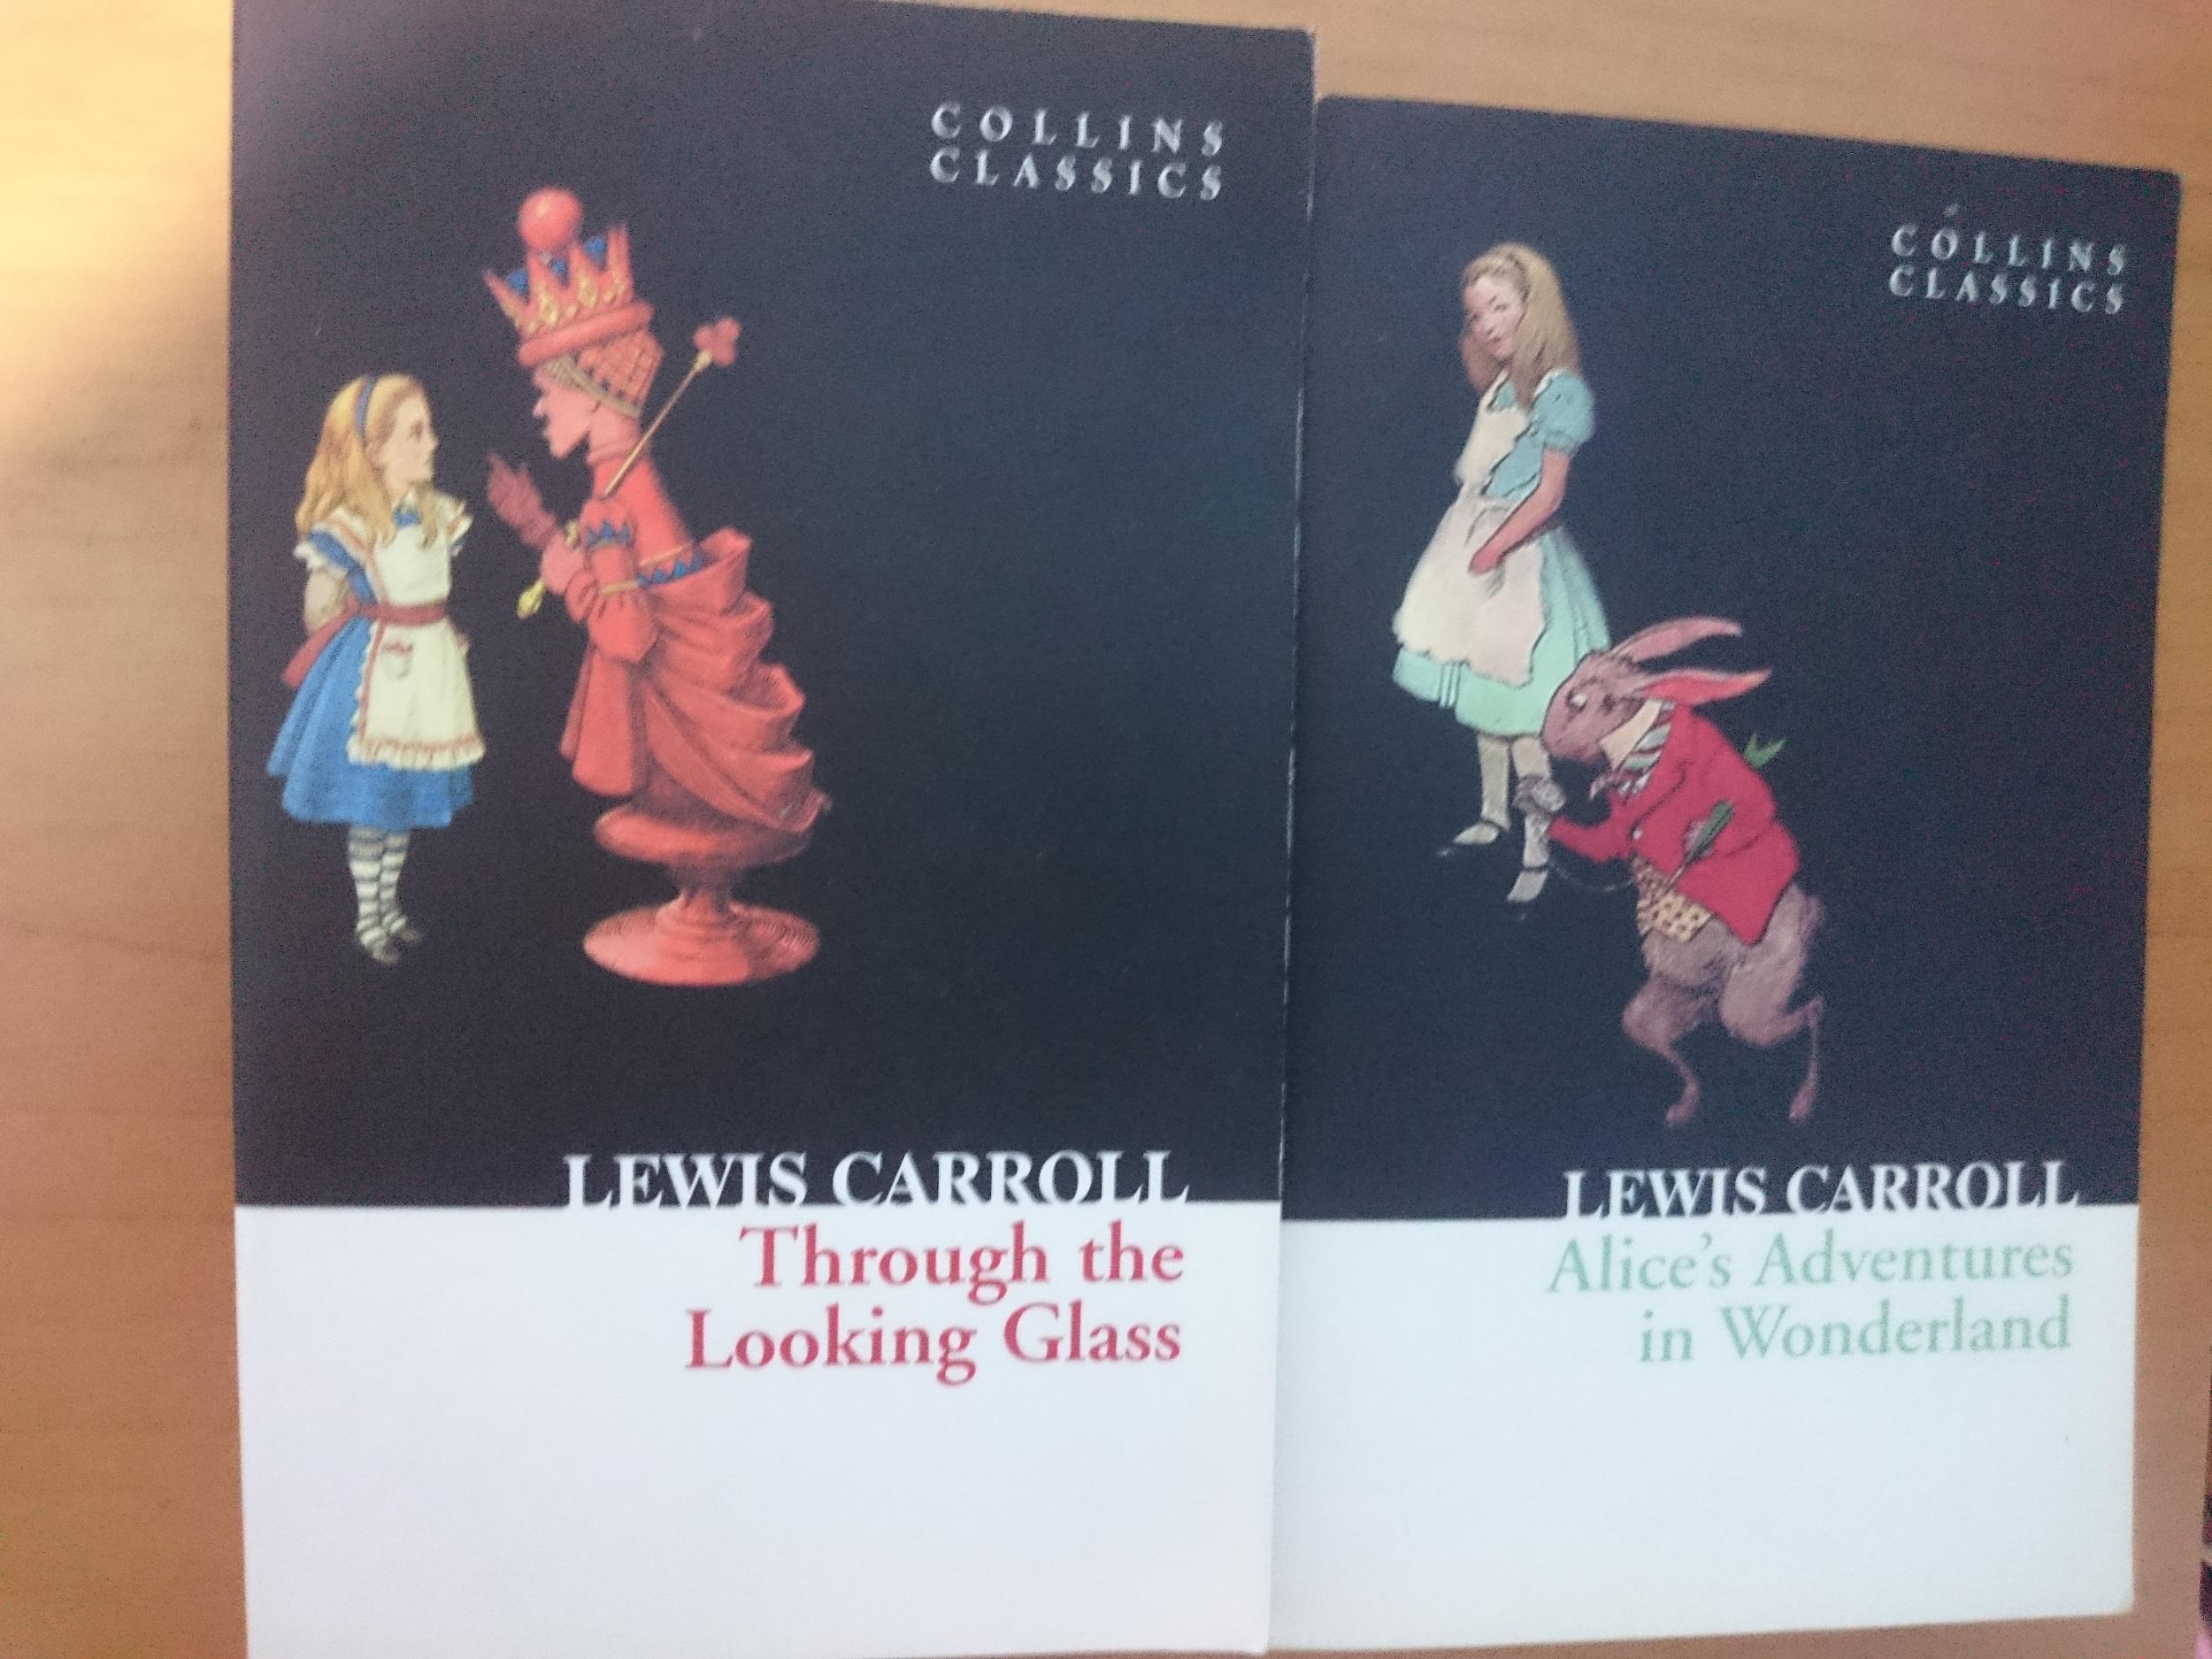 livres complets sans résumé (rares) en anglais : Alice's adventures in wonderland and through the looking glass